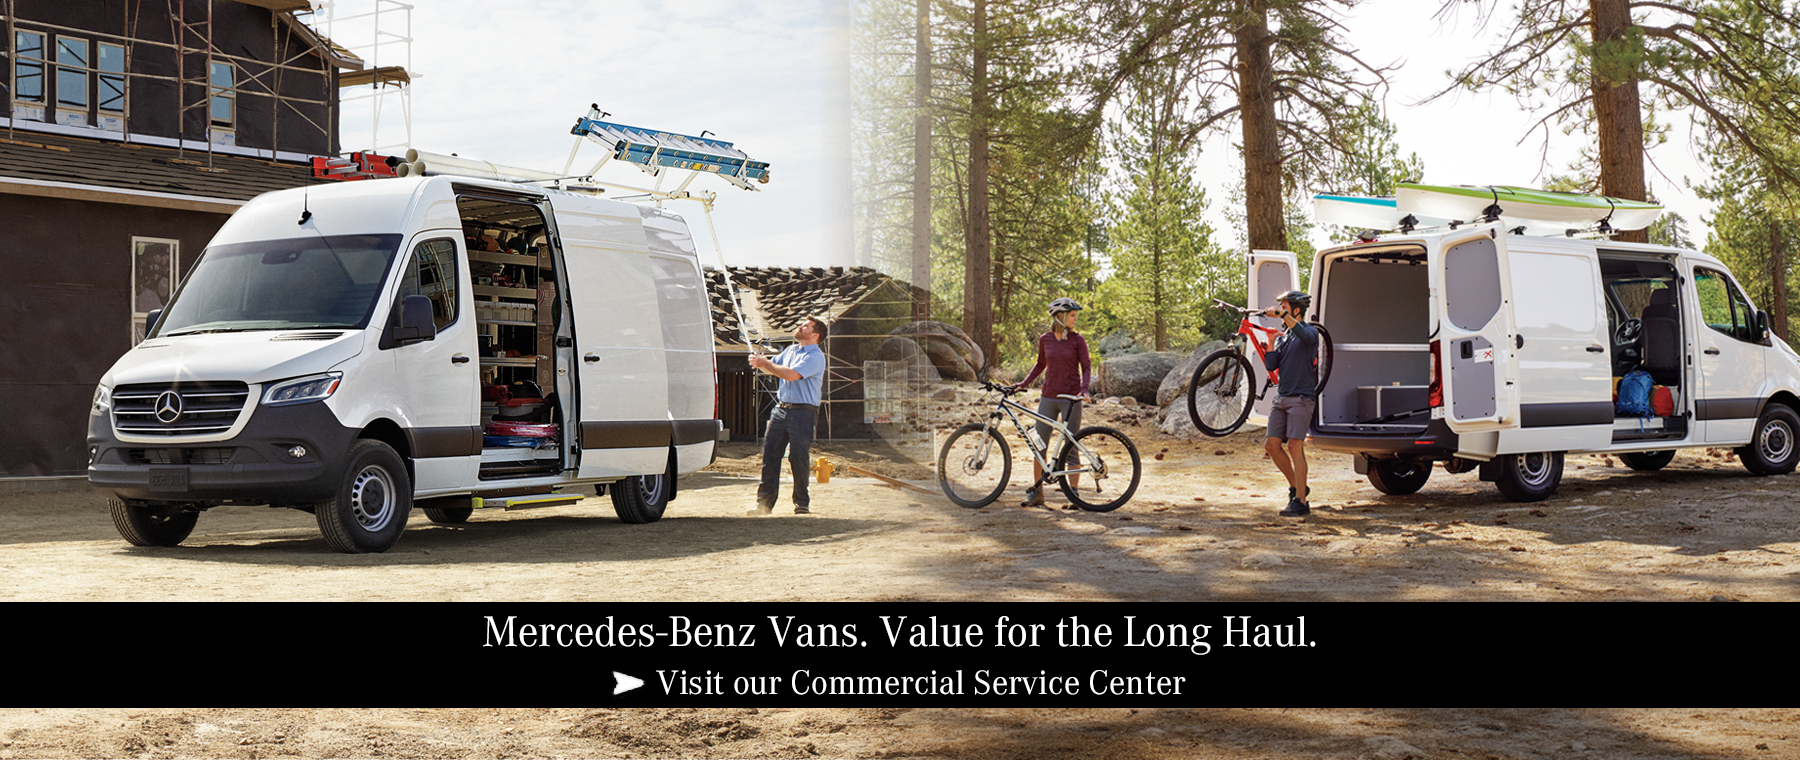 Mercedes-Benz Vans. Value for the Long Haul